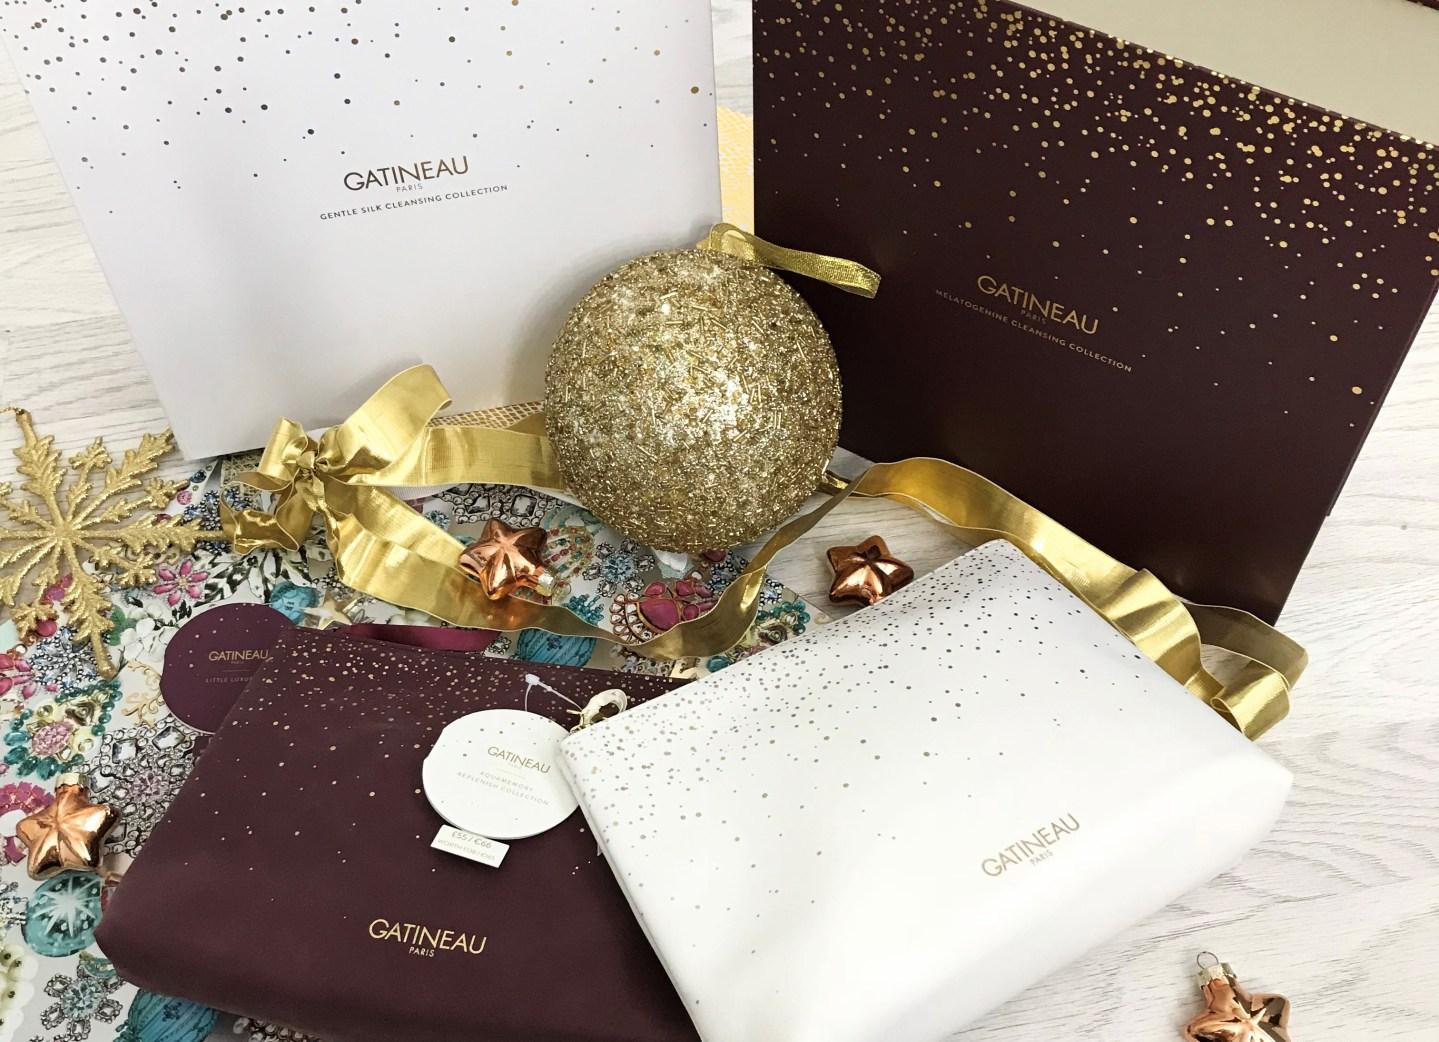 Gatineau's Christmas Collection